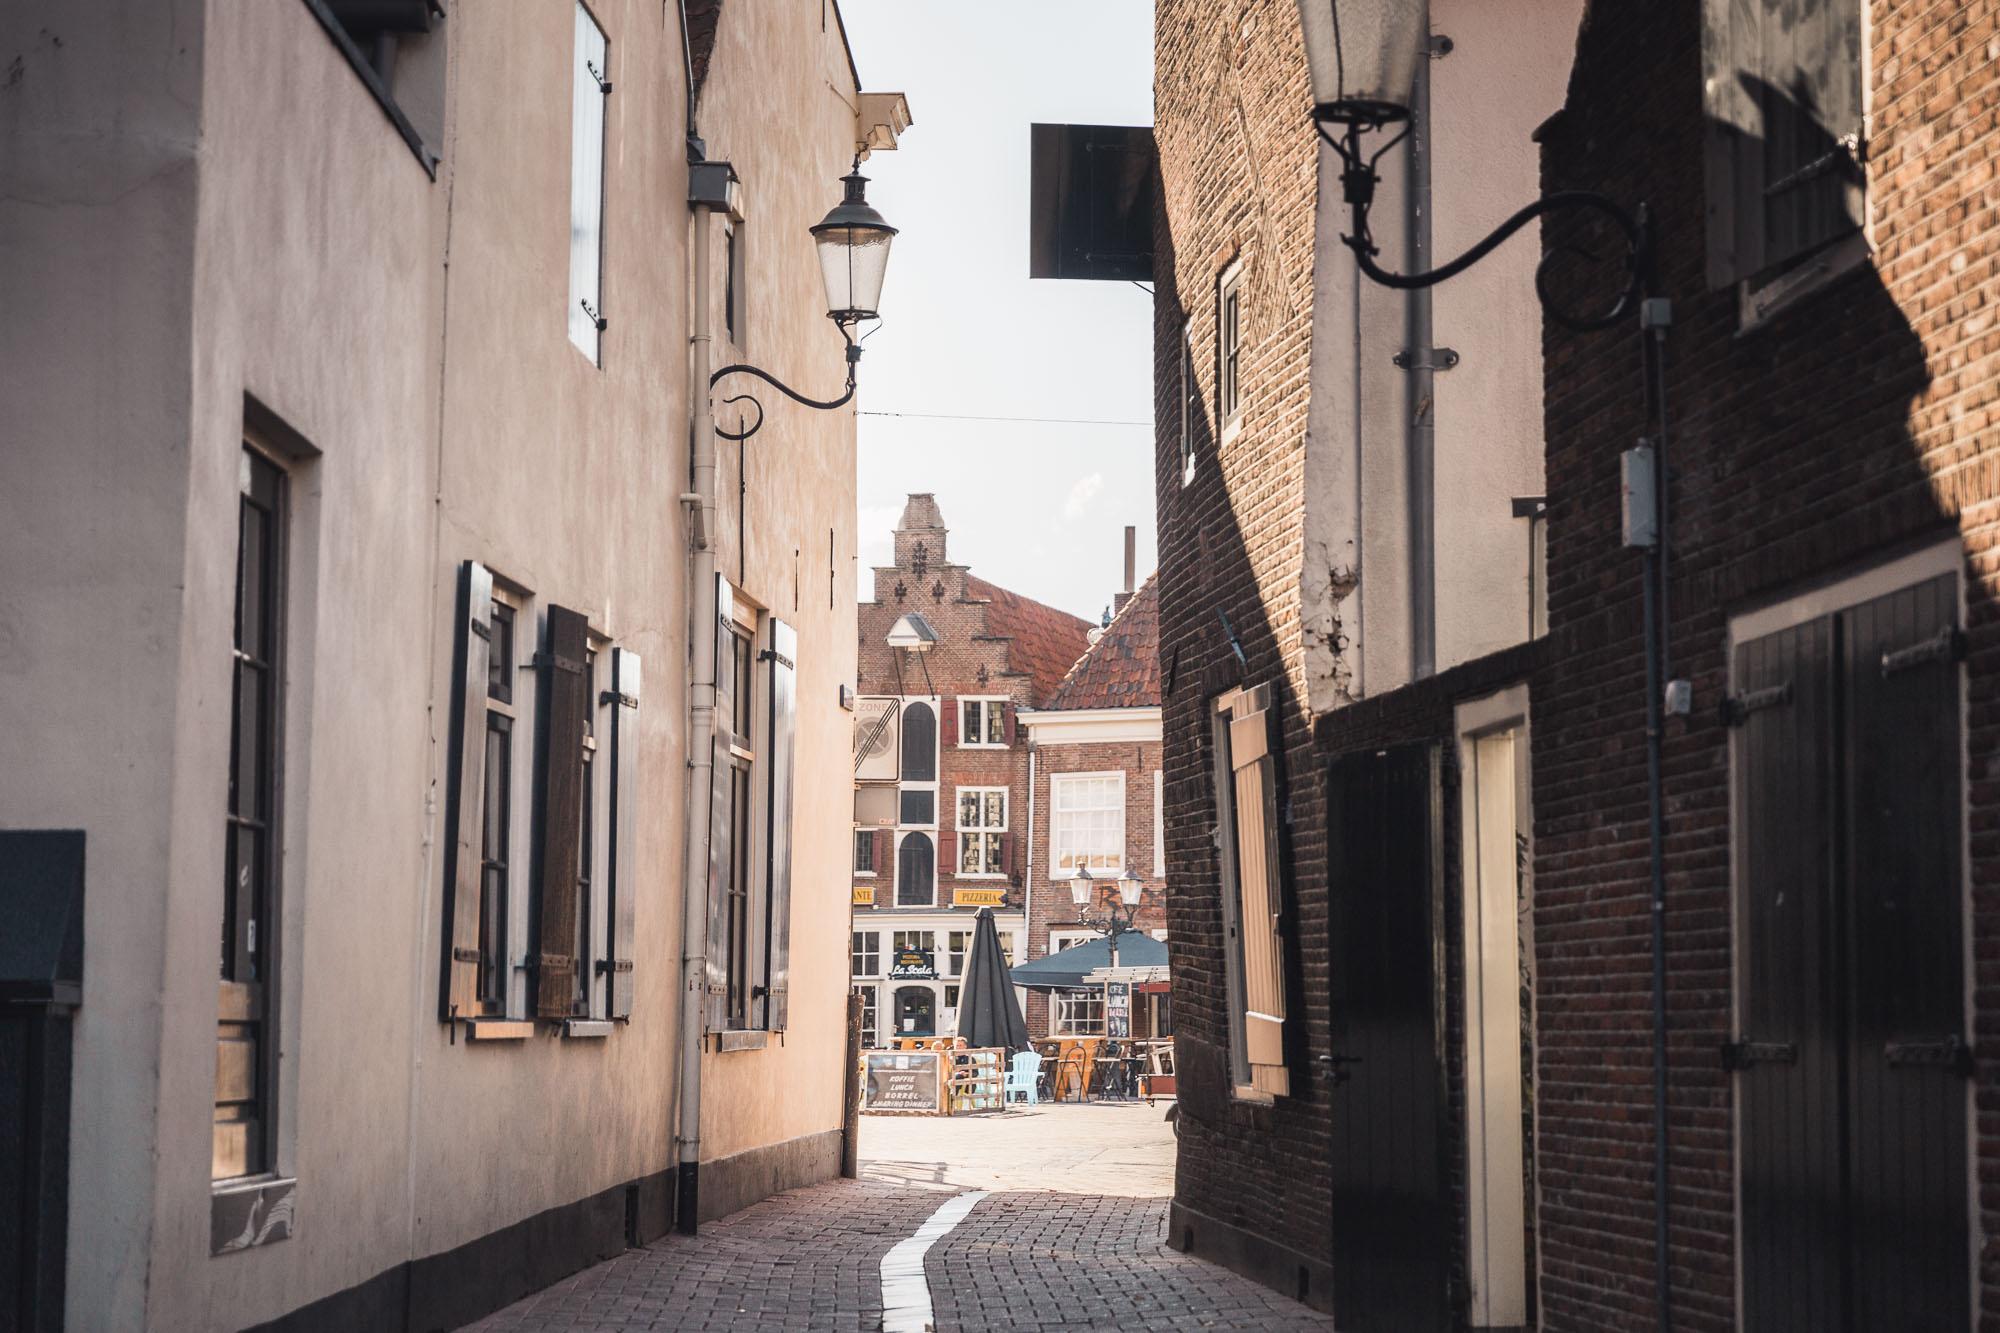 Old cobblestone streets in Amersfoort, Netherlands